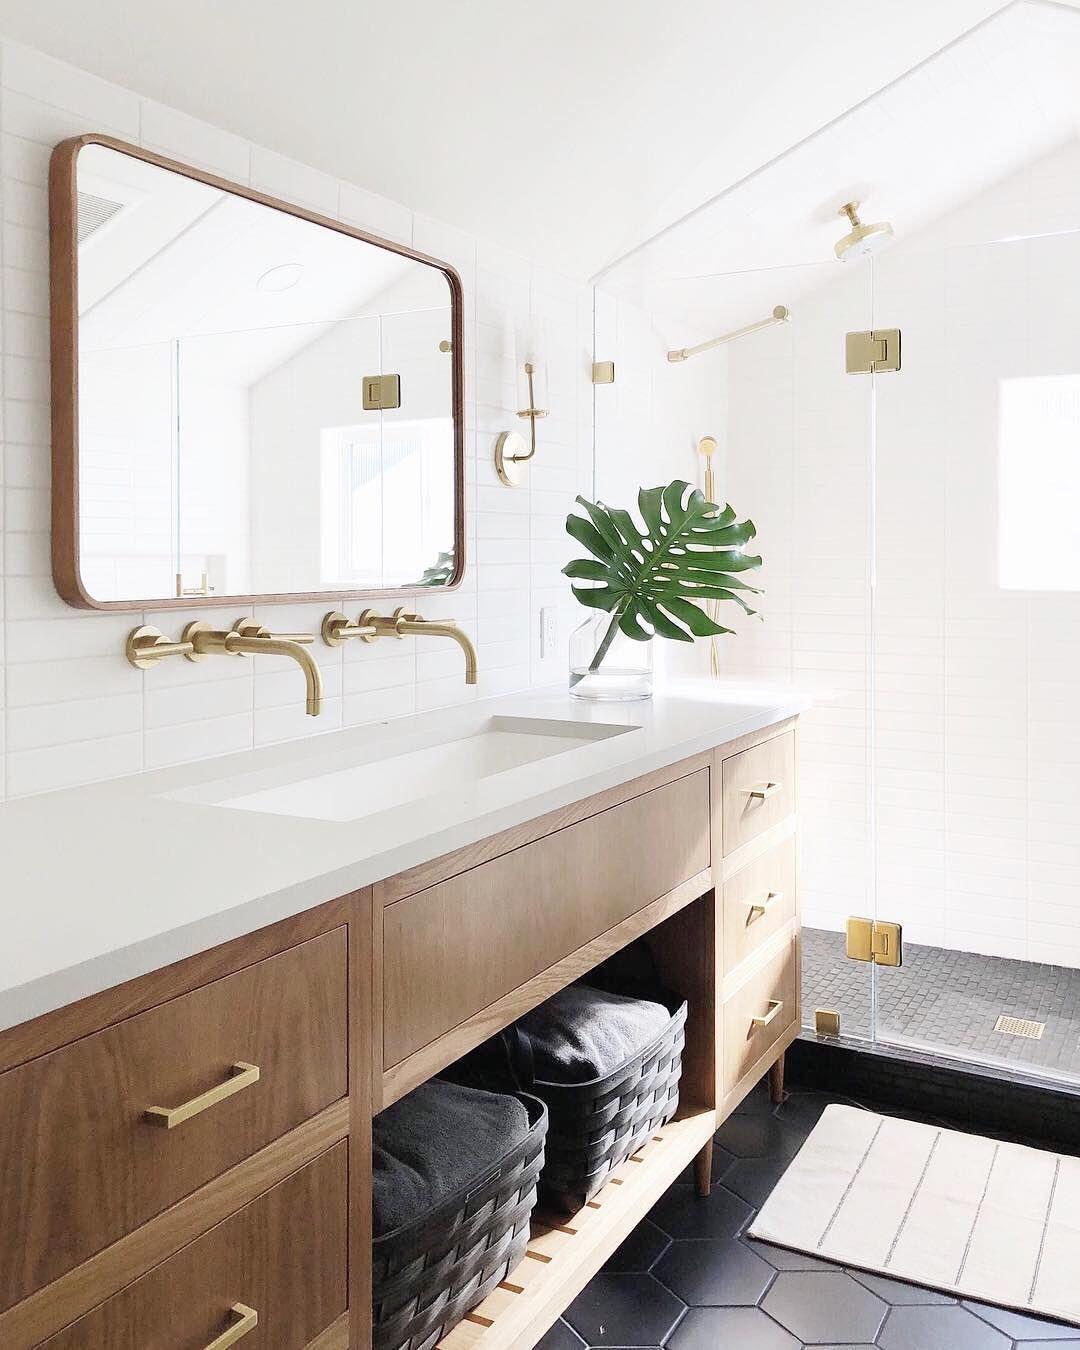 Interior Design Online Courses Interior Design Ideas School For Interior Design Near Me Interio 2020 Banyo Ic Dekorasyonu Banyo Yeniden Modelleme Banyo Yenileme